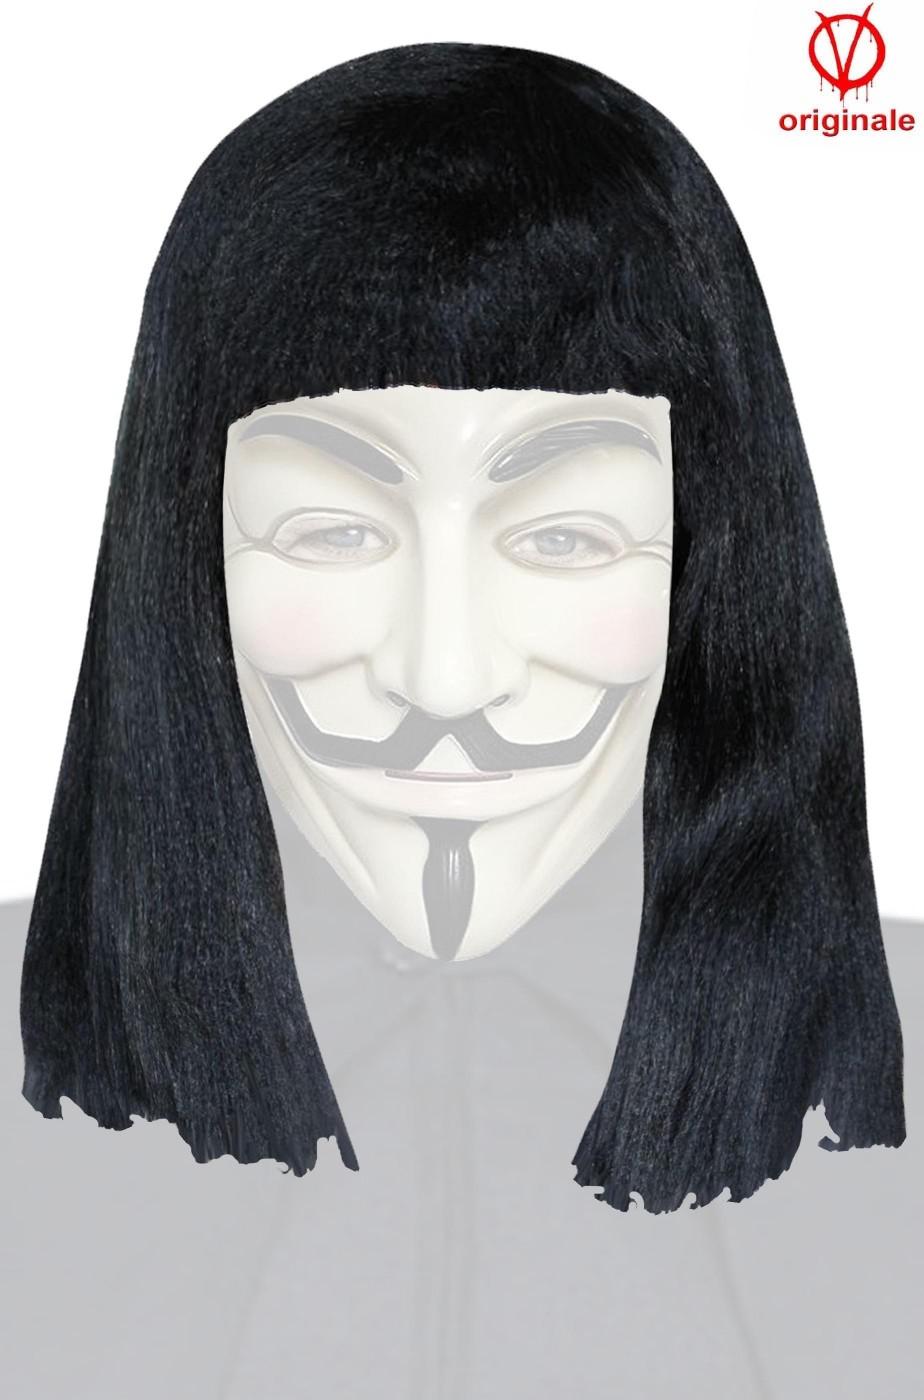 Parrucca originale V per Vendetta nera Guy Fawkes